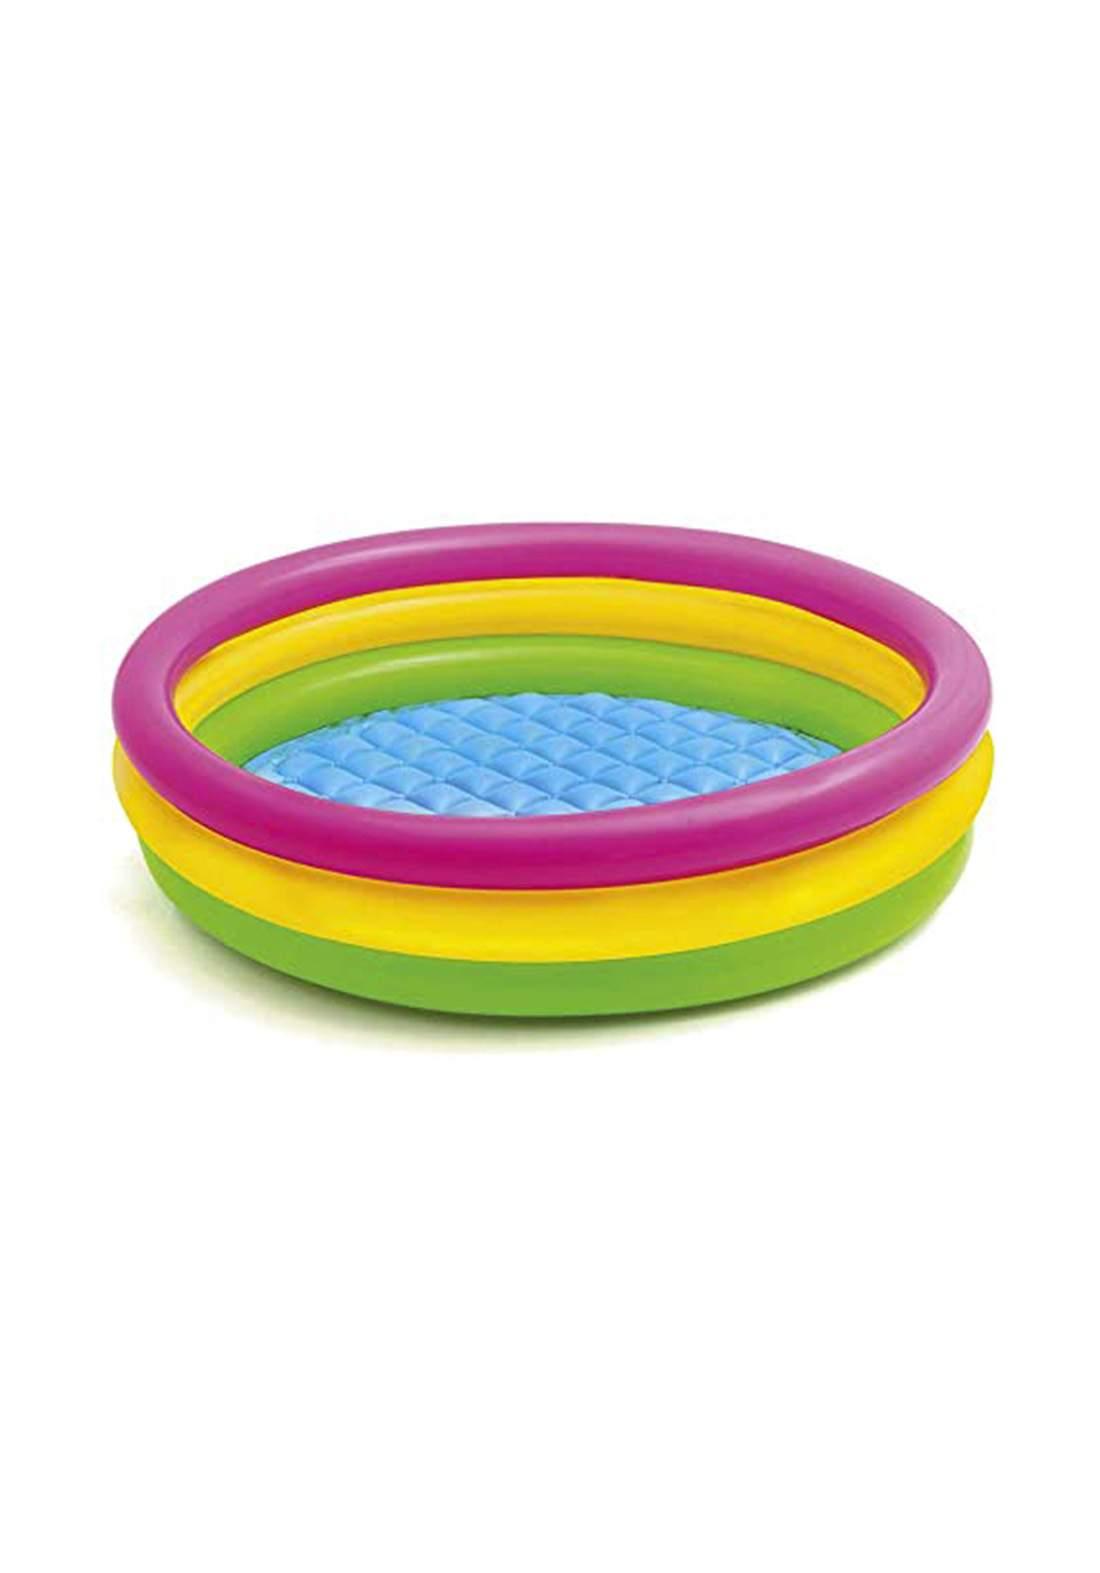 Intex 57412 Inflatable 3 Rings Kids Large Pvc Baby Play Swimming Pool مسبح